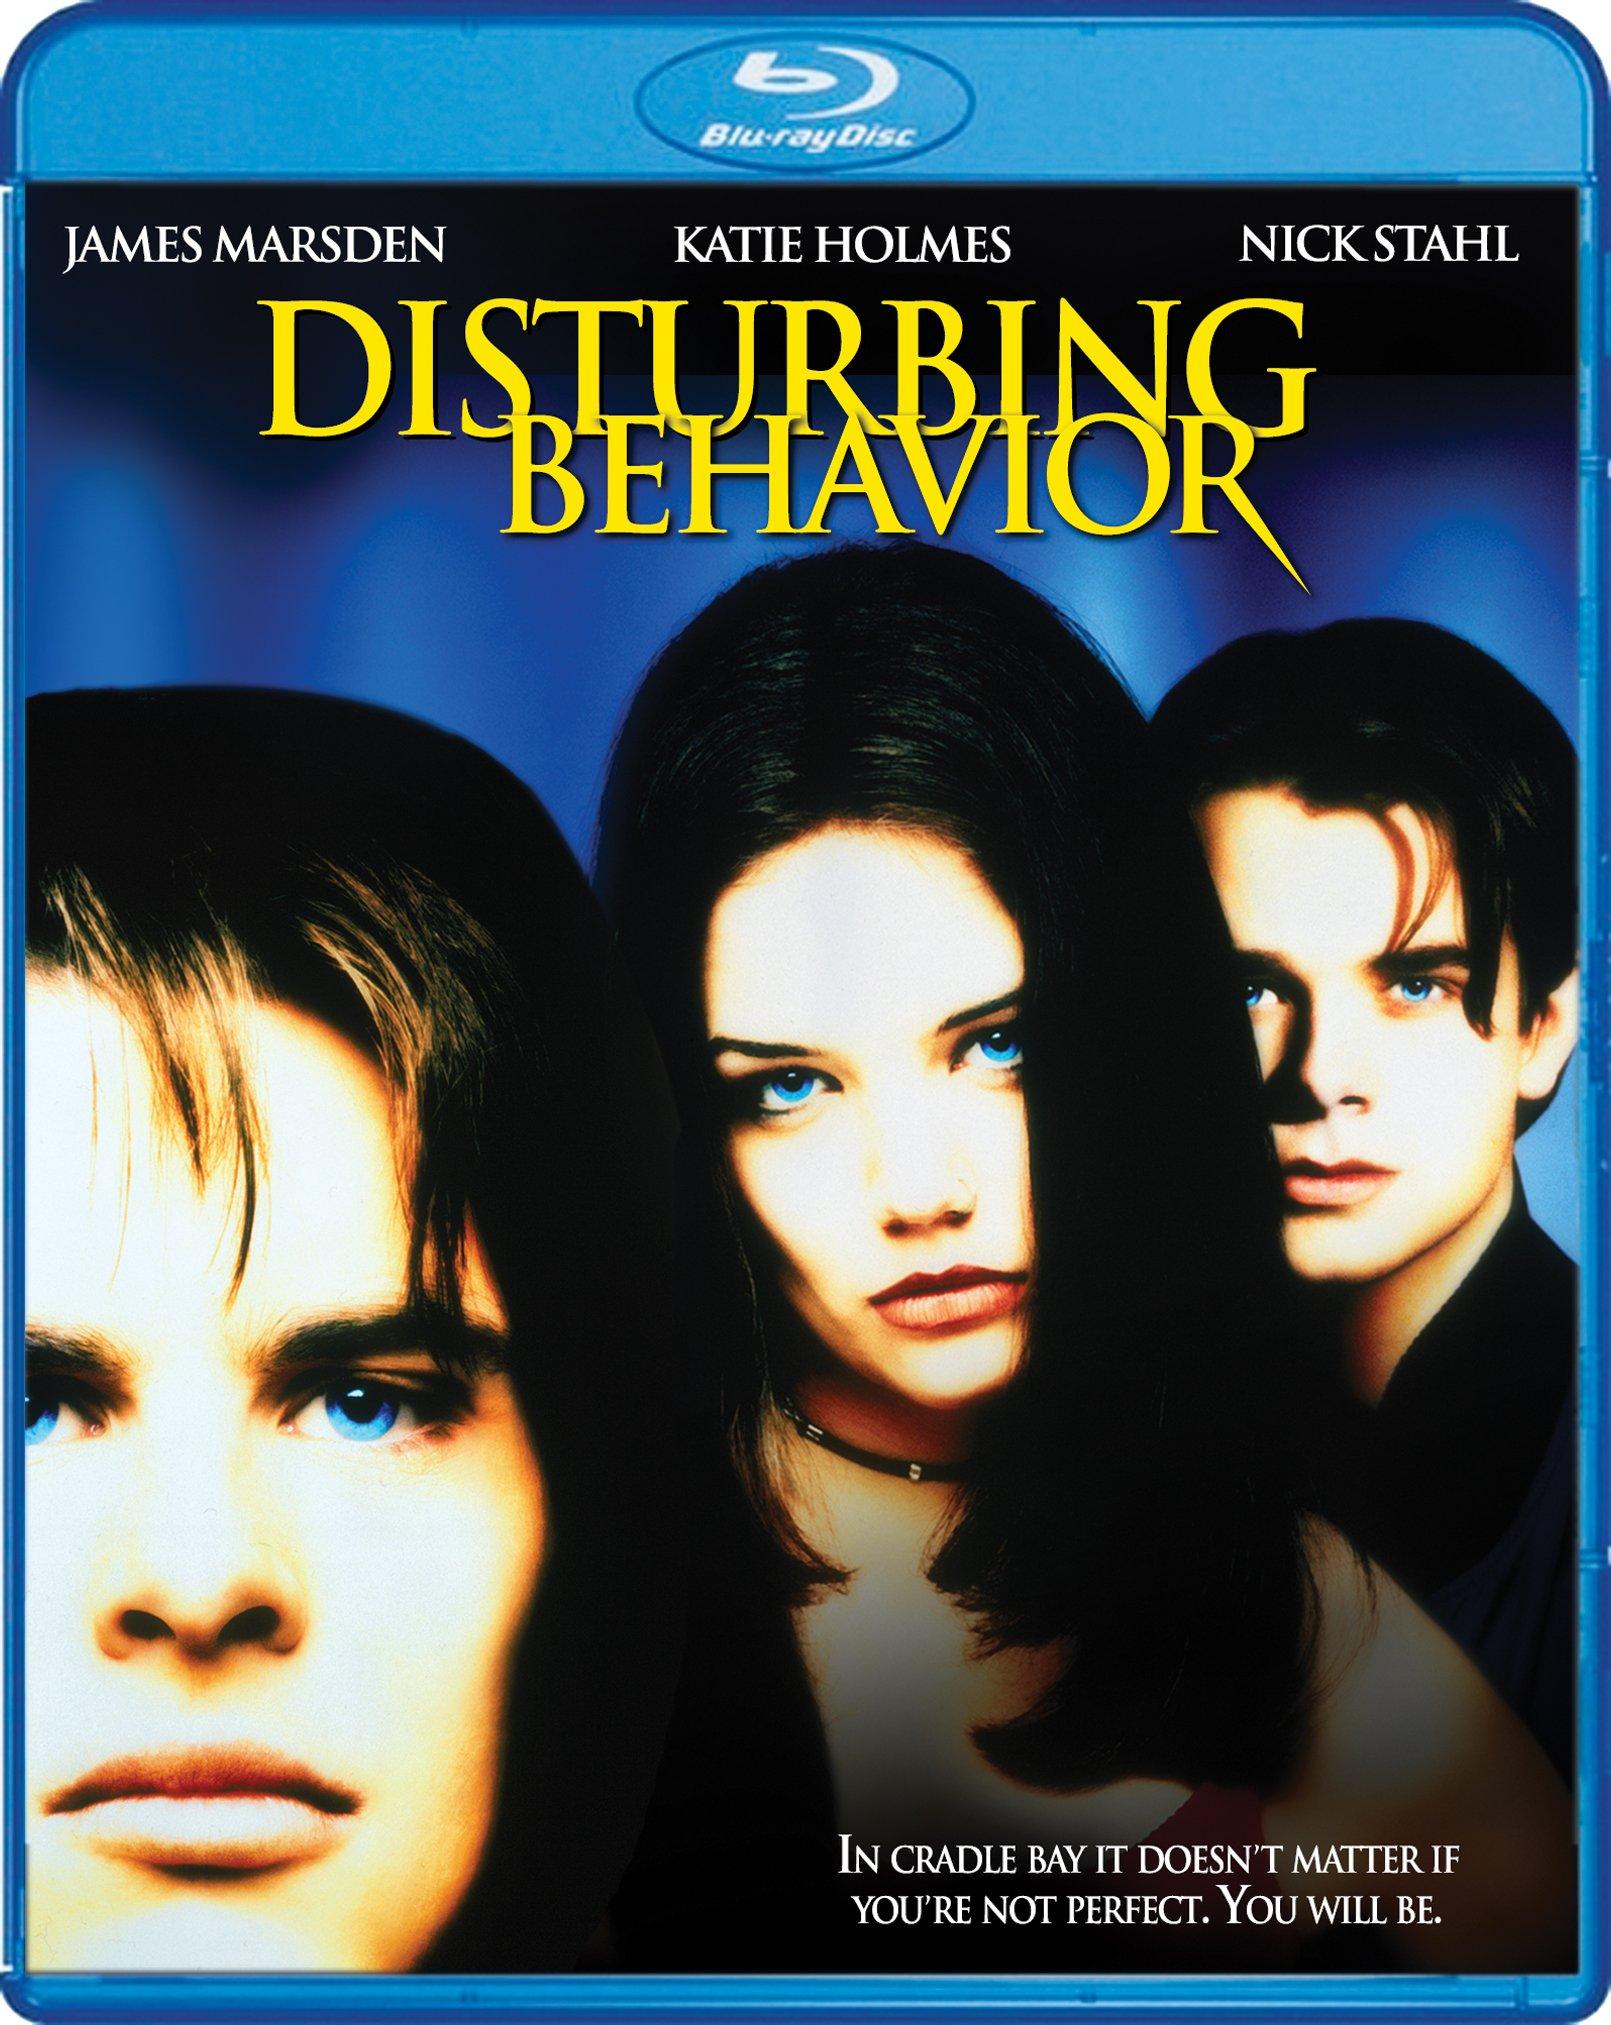 Blu-ray : Disturbing Behavior (Widescreen)